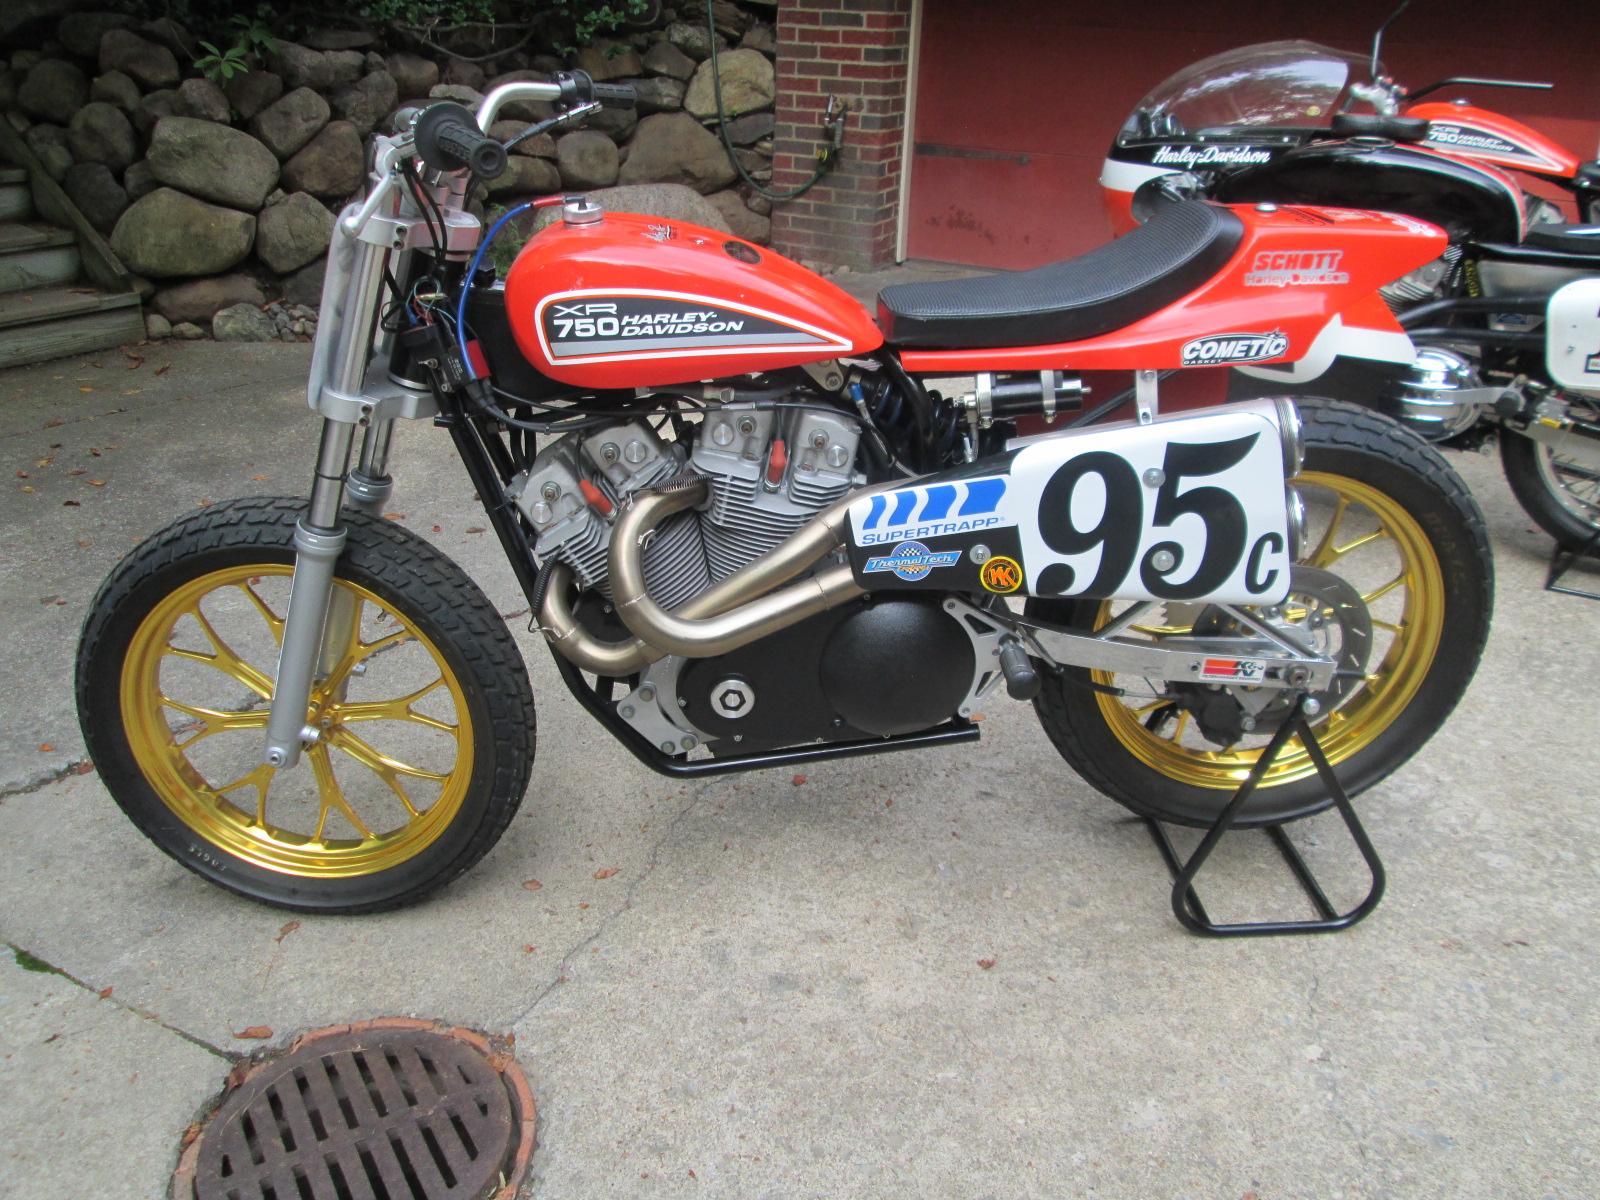 XR750 Pic 2